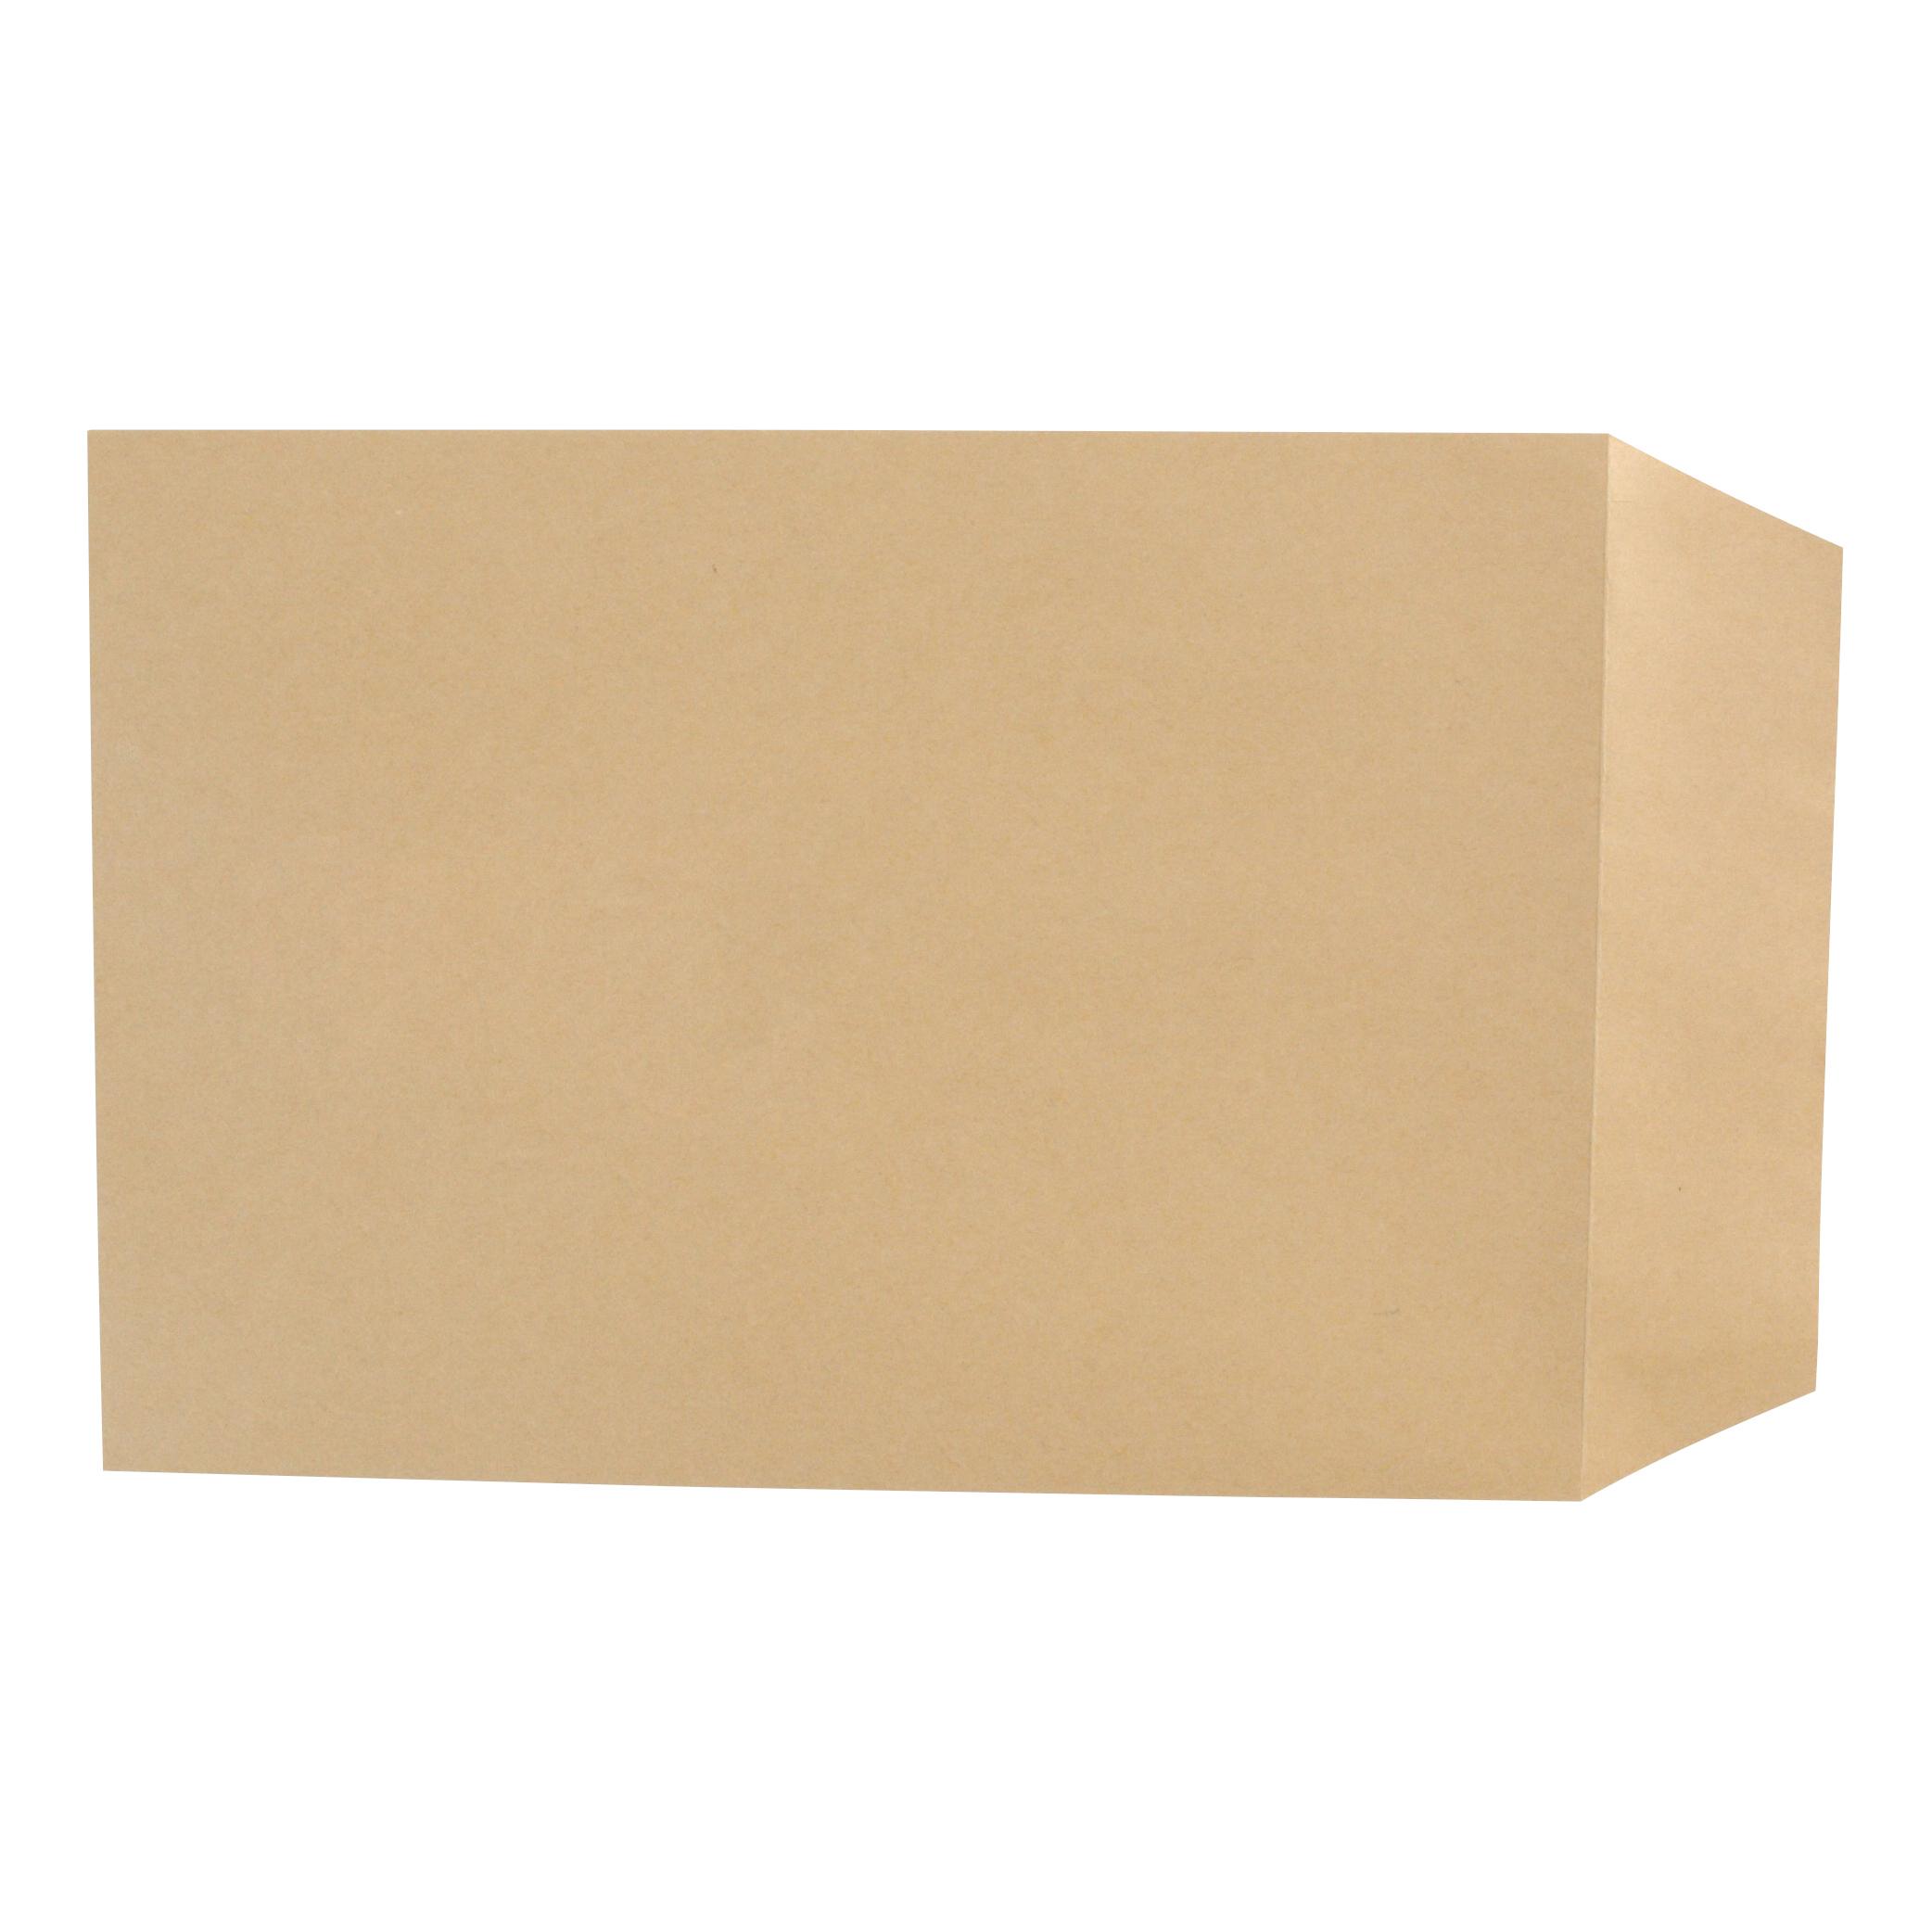 Basildon Bond Envelopes C5 Recycled Pocket Peel and Seal 90gsm Manilla Ref B80189 [Pack 500]